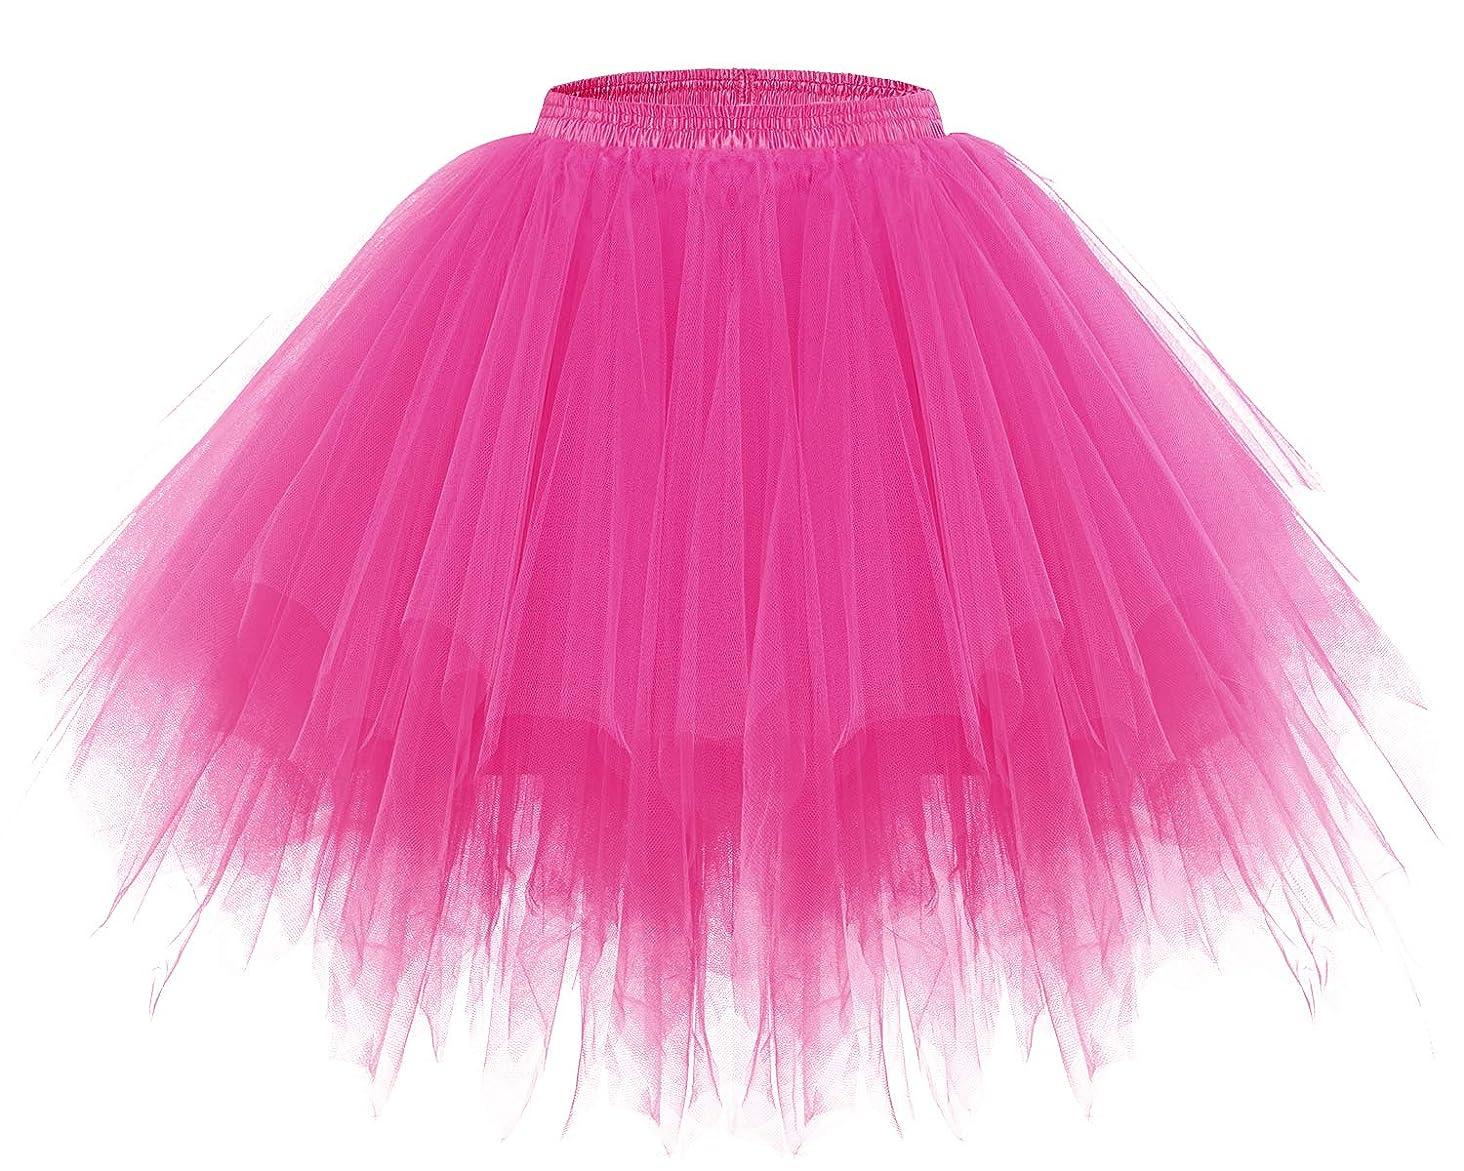 Bridesmay Women's Short 1950s Vintage Petticoat Ballet Bubble Skirt